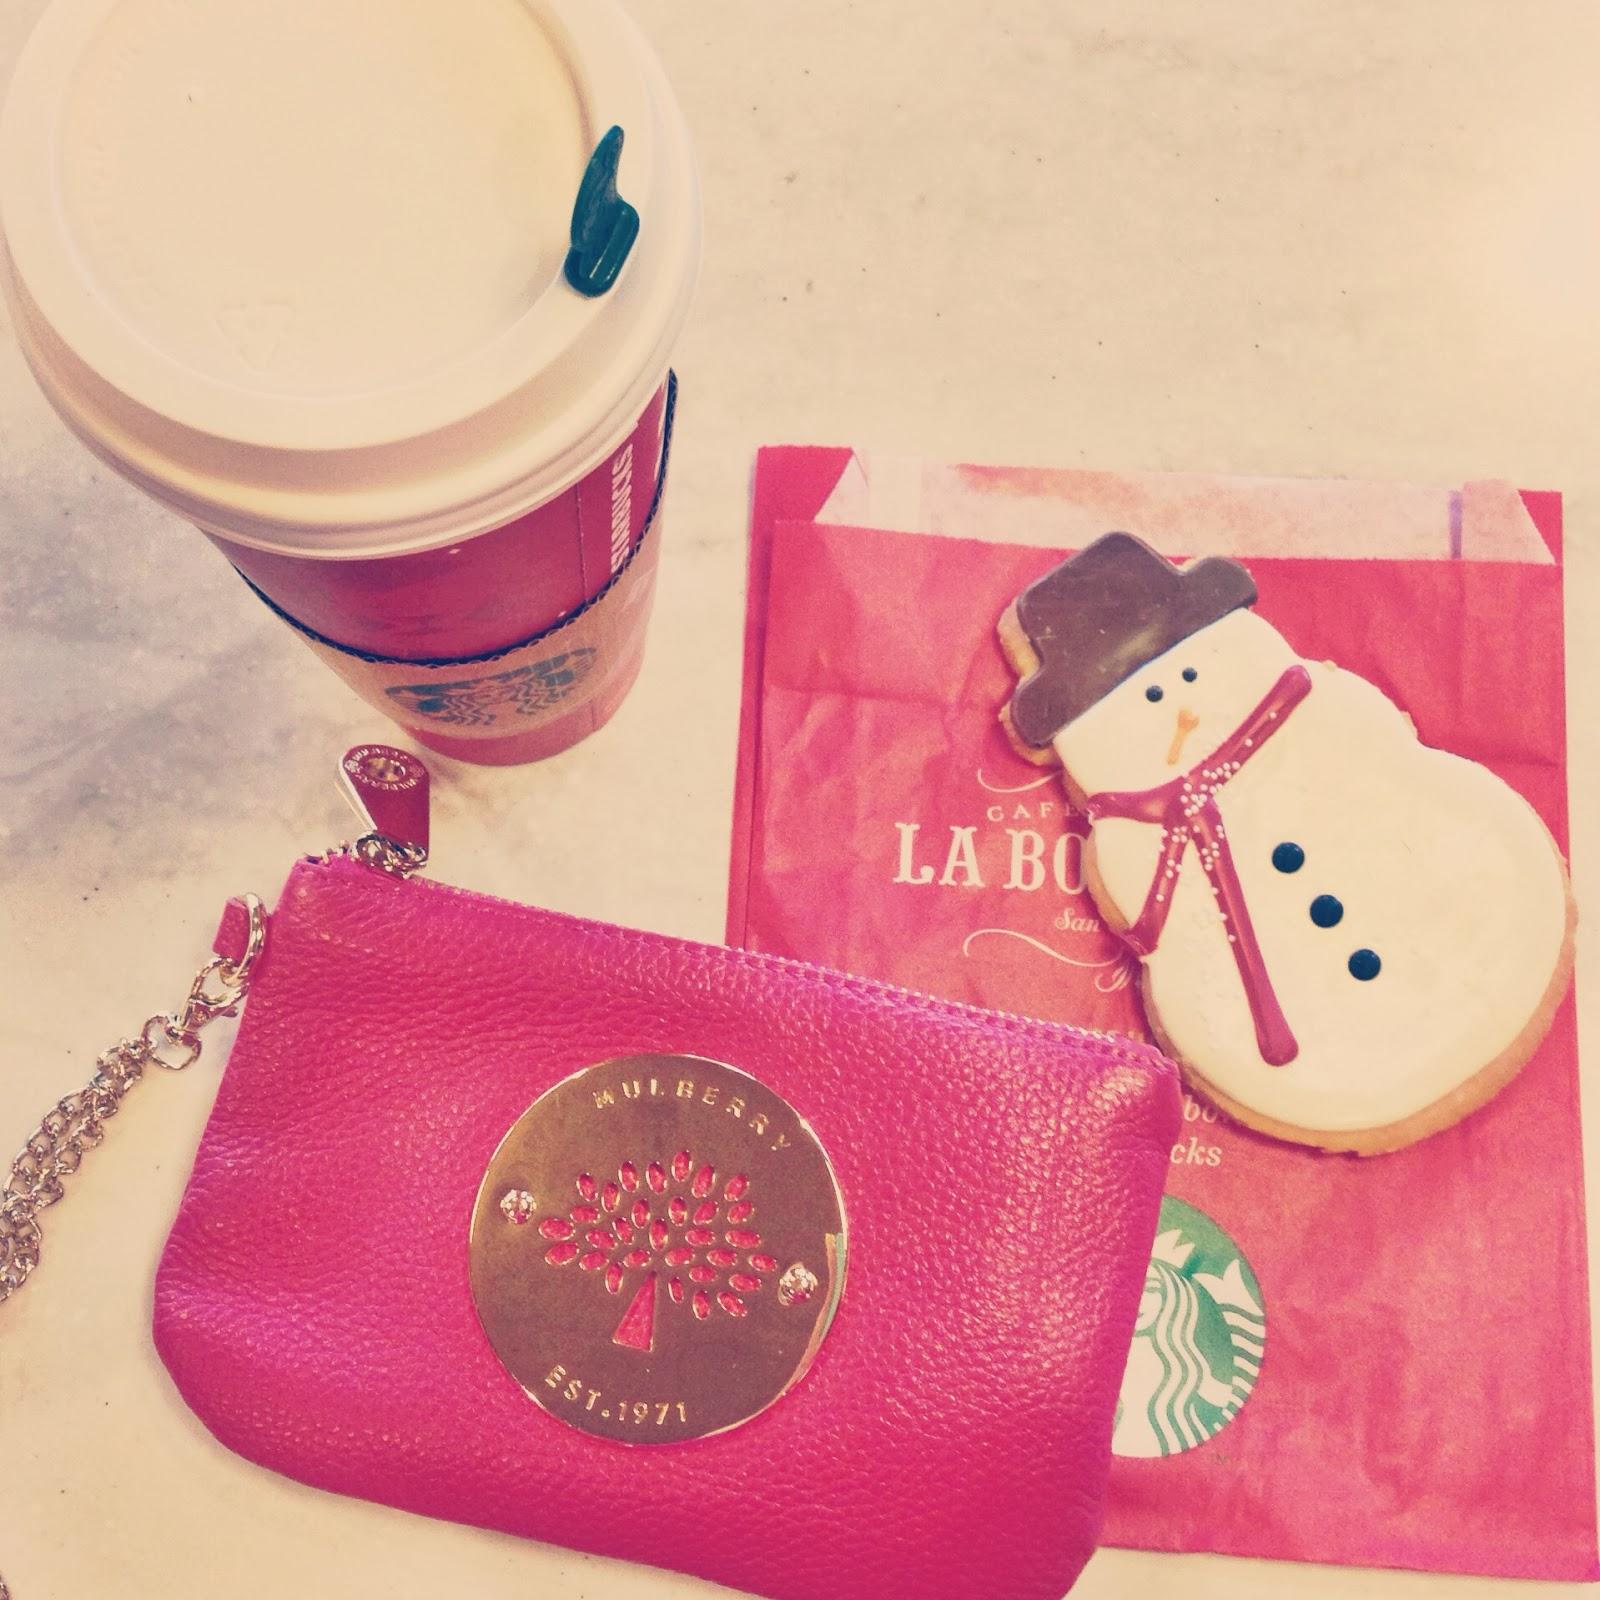 Lily Pulitzer Starbucks Christmas 2013 Bowtiful Life